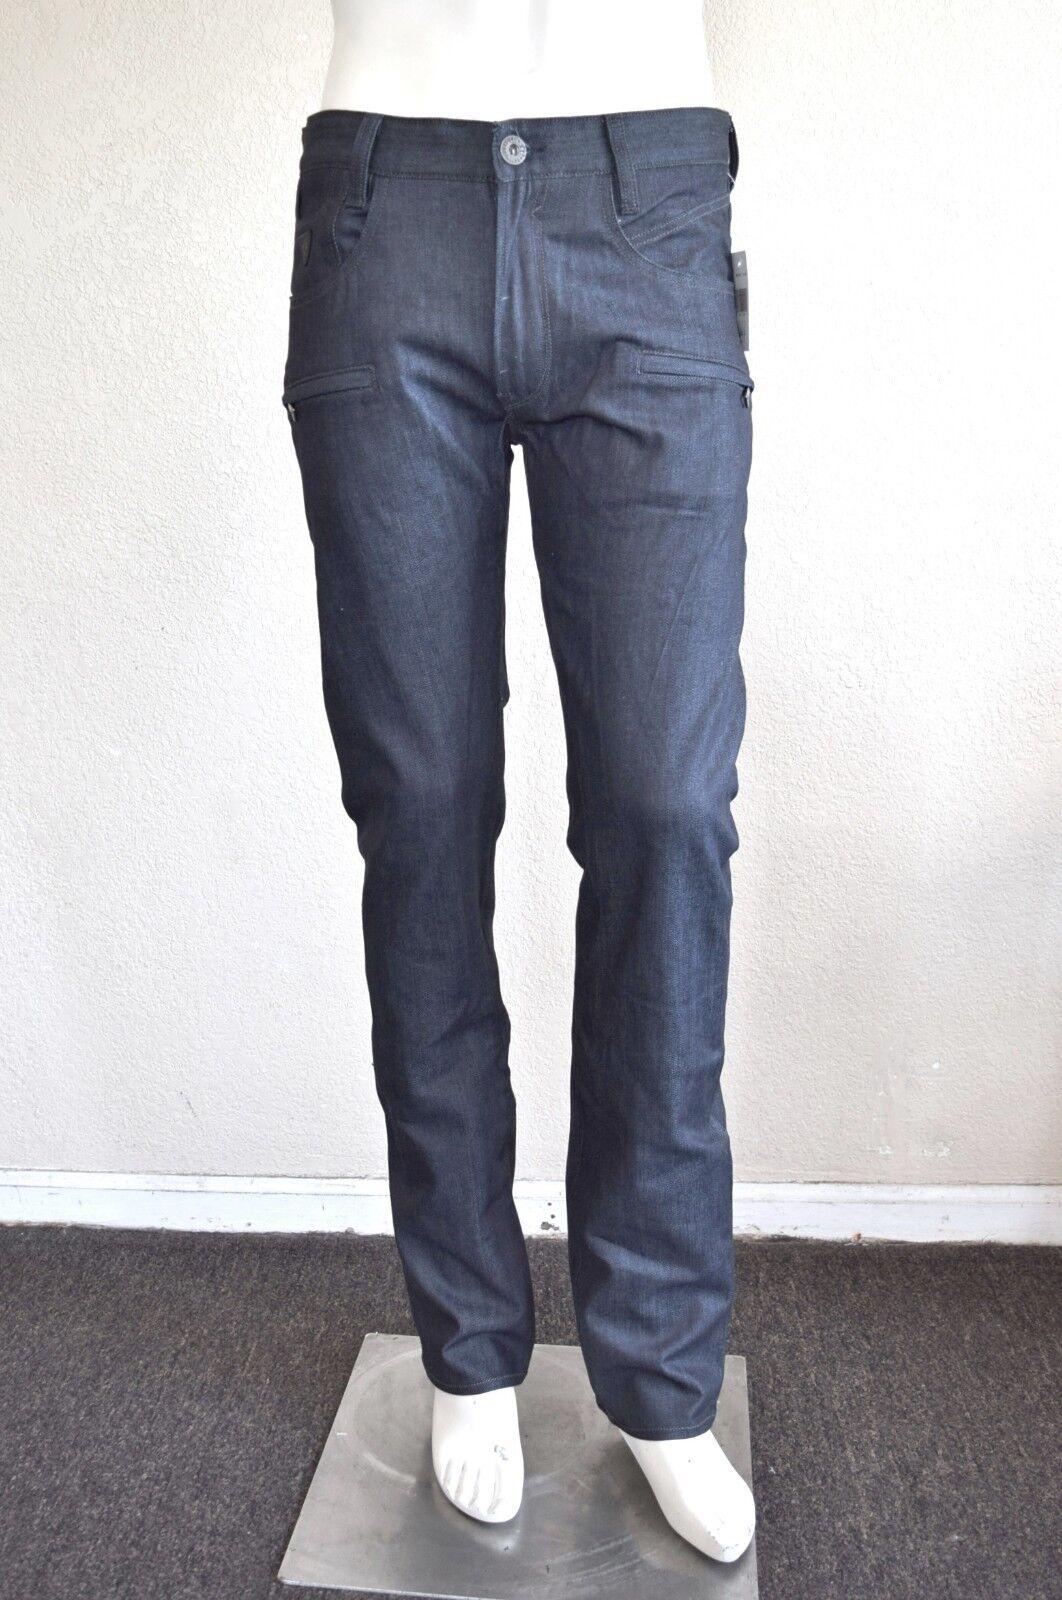 9f34d47a ... New HI-Q Men Classic Jeans Knee Drape Panel Moto Biker Jeans Size  28-40( 566). GUESS Men's Alameda Slim Tapered – Indigo Wash sz 32